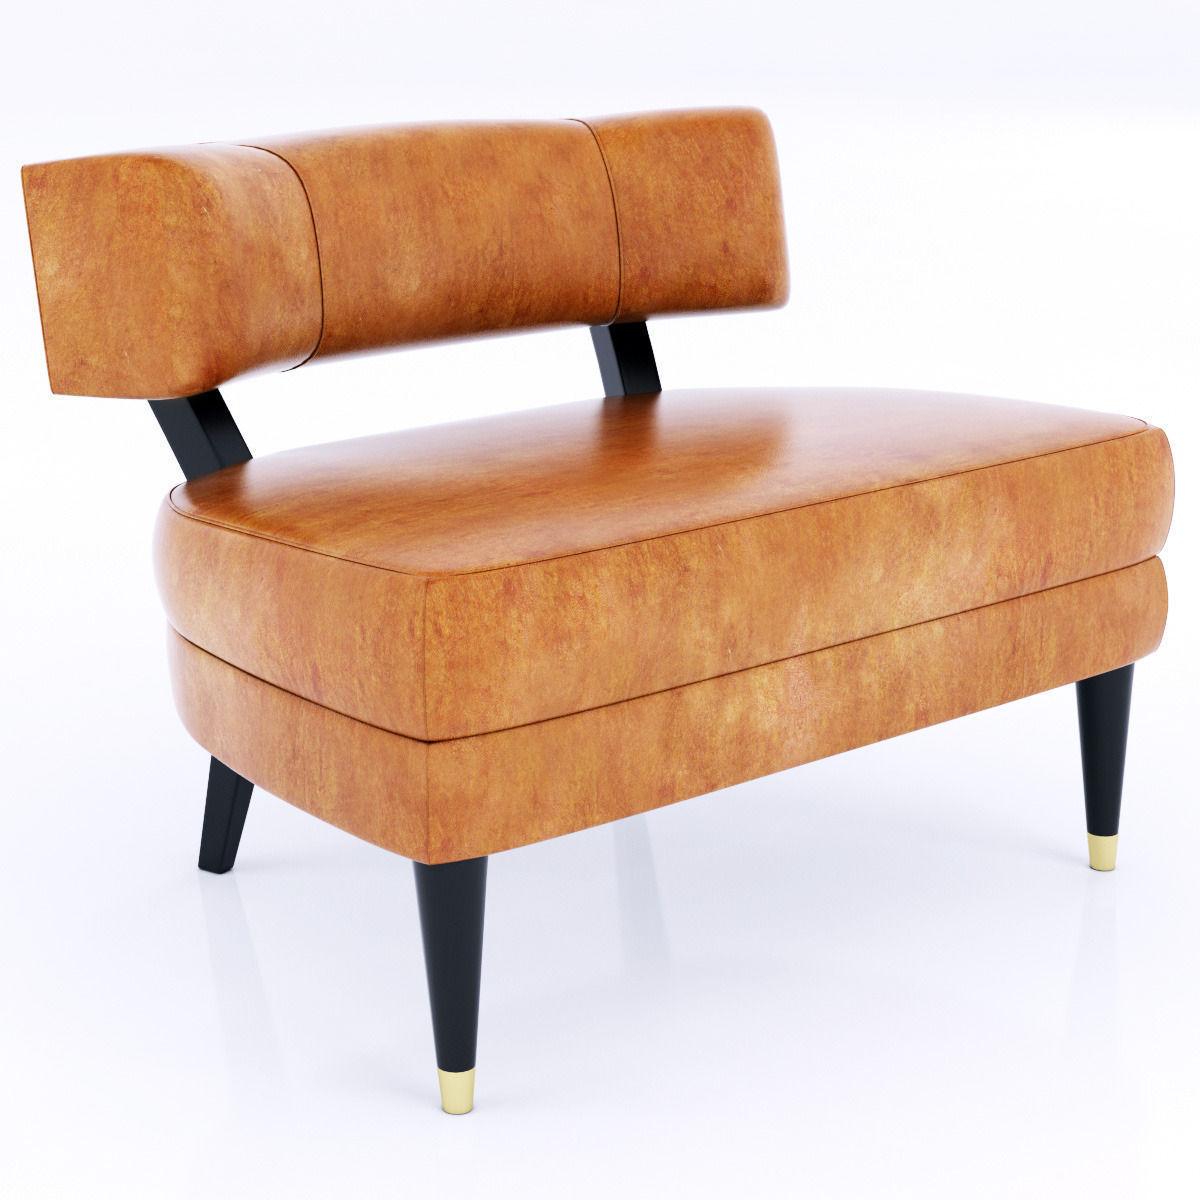 Wondrous Jean De Merry Tribeca Chair 3D Model Pdpeps Interior Chair Design Pdpepsorg